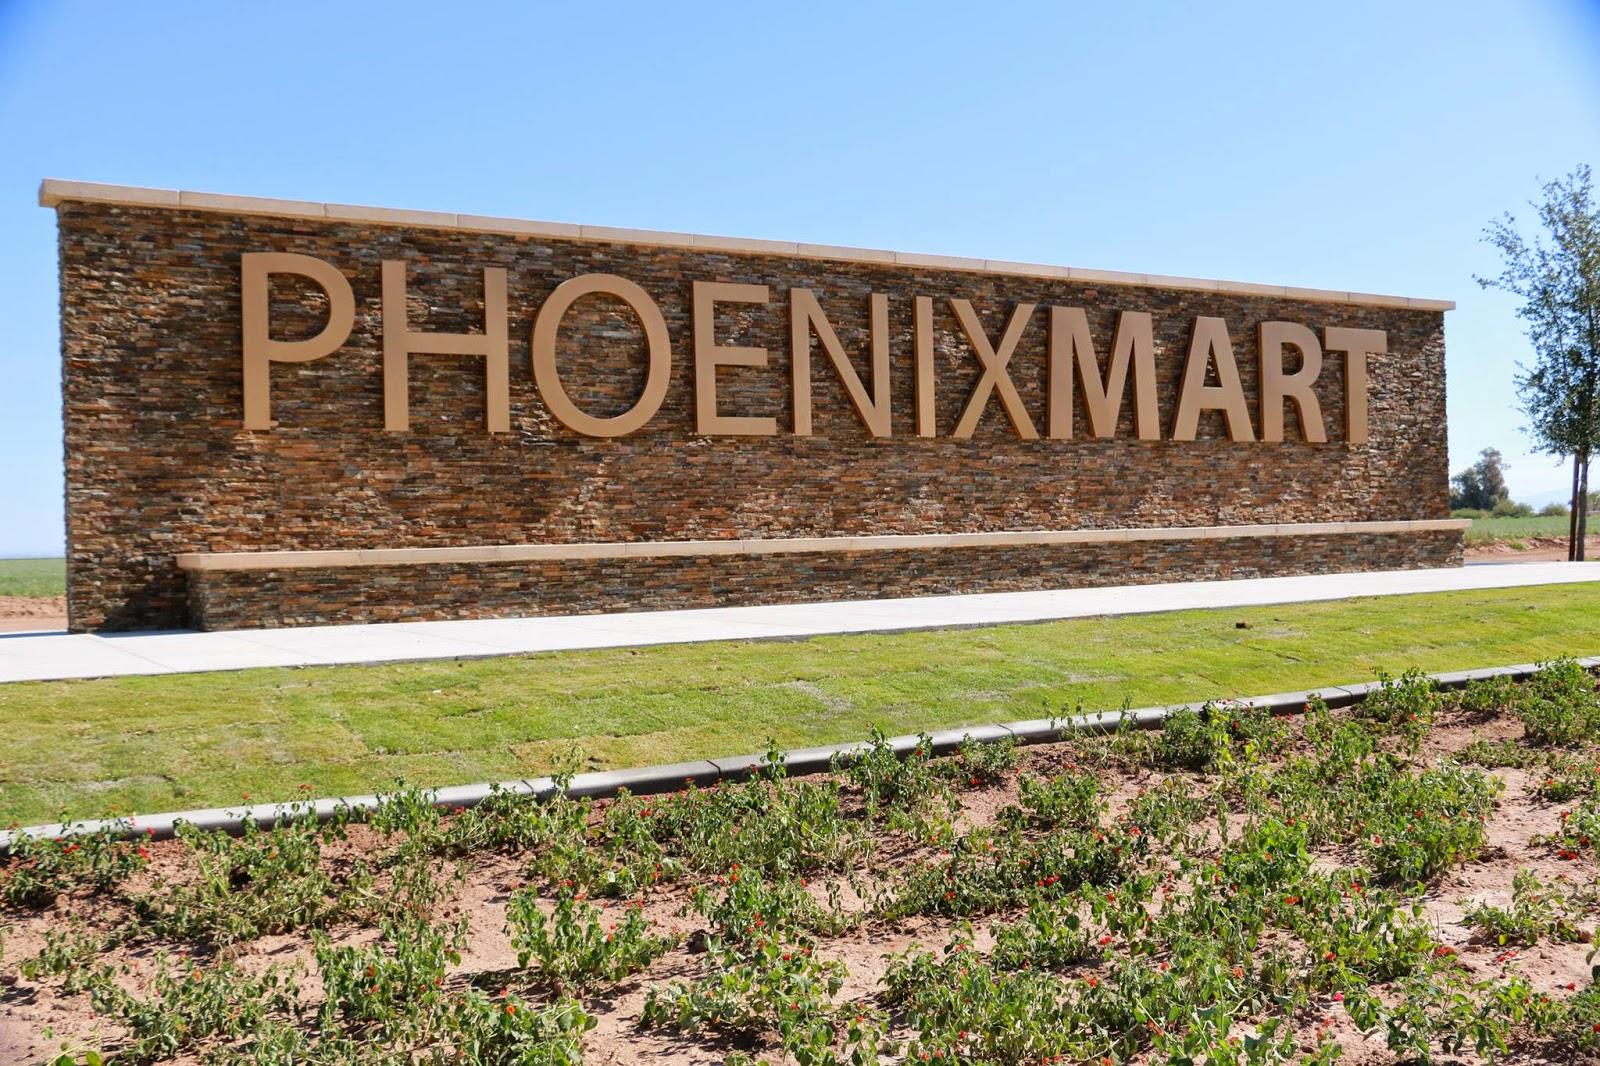 Phoenix Mart Casa Grande